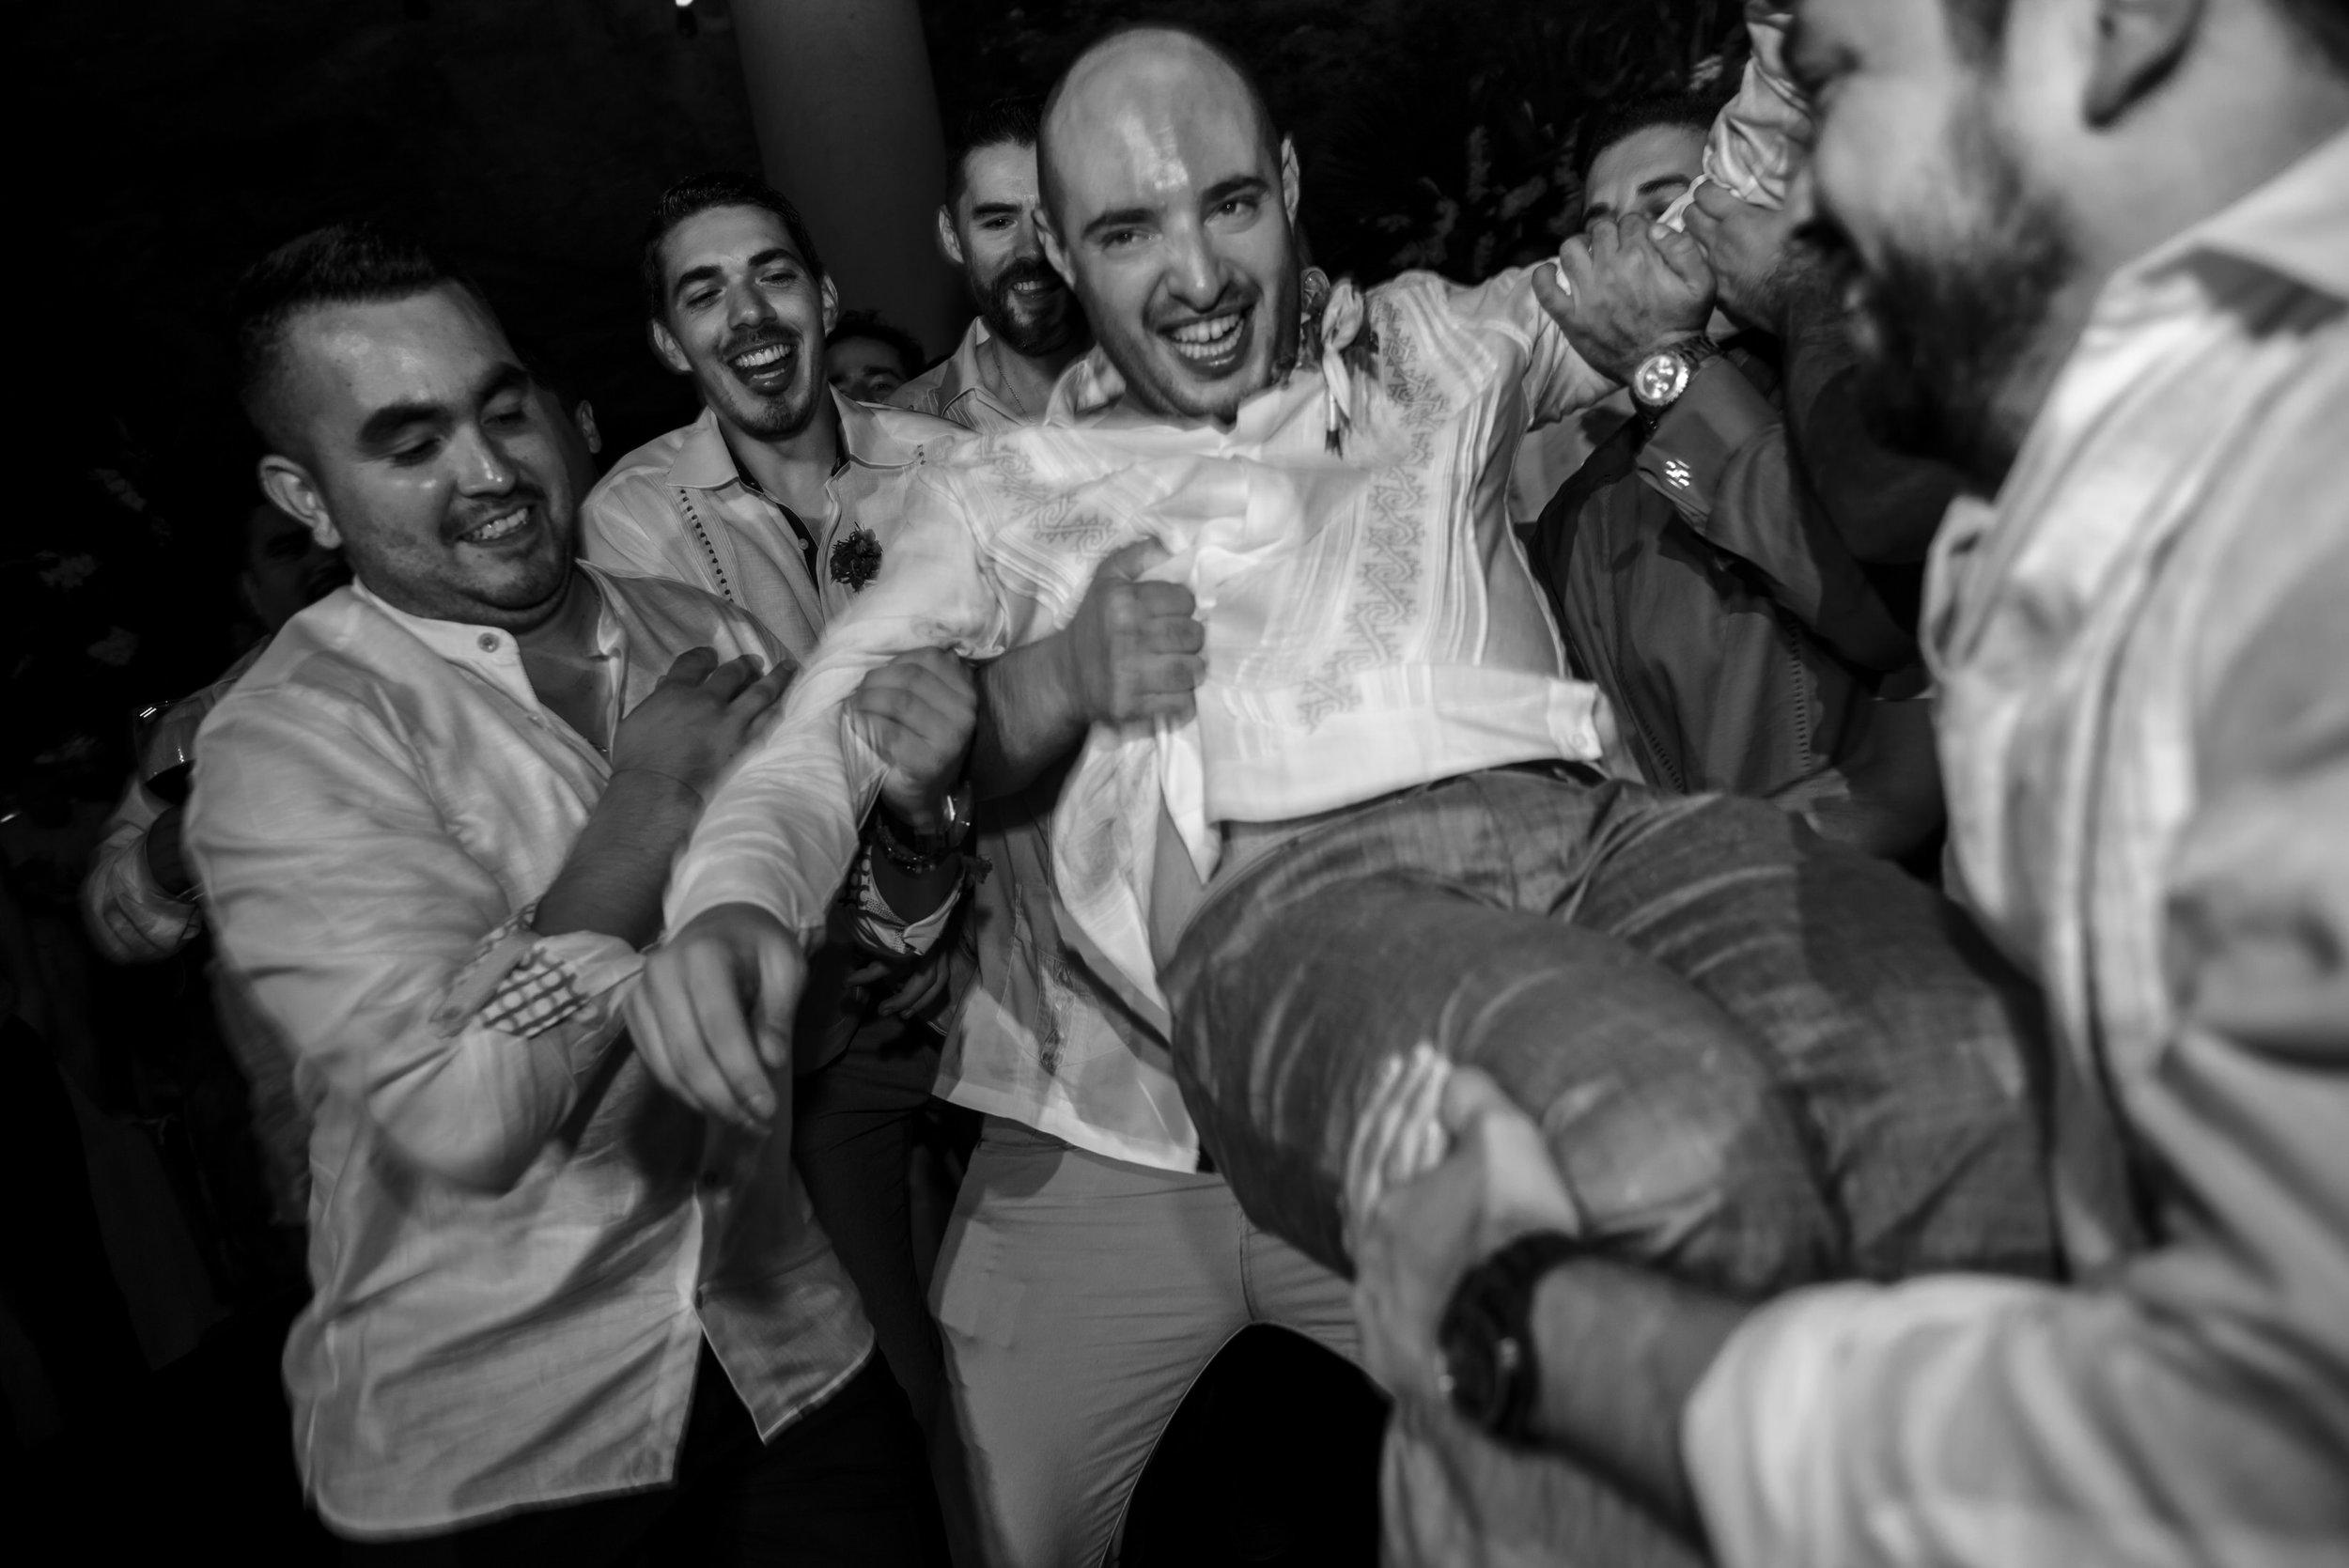 cancun_wedding_photographer_mexico (116).jpg